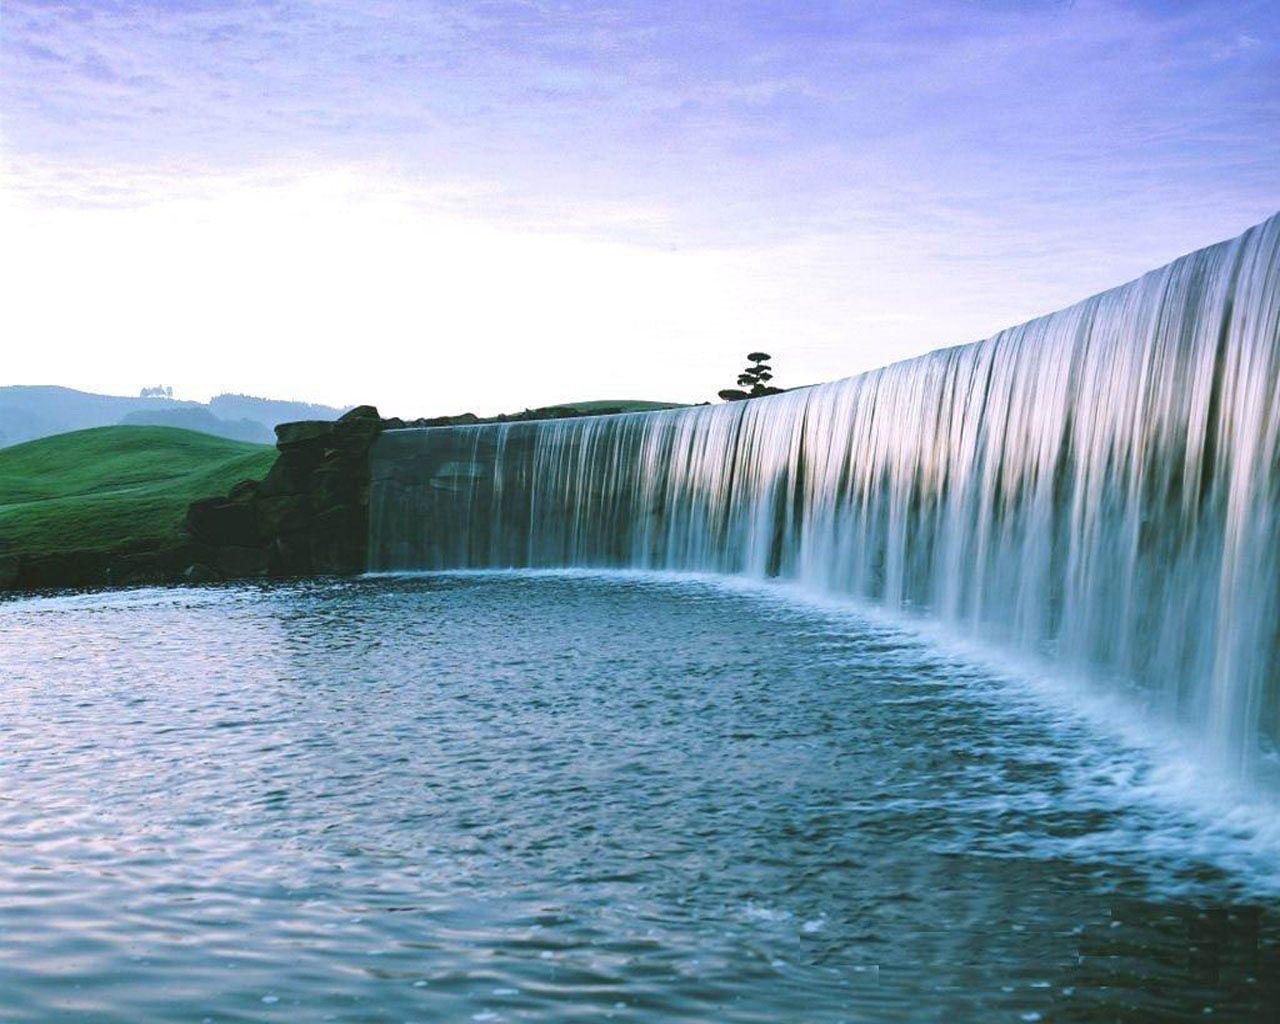 Amazing 3d Live Wallpapers Hd Waterfall Waterfall Wallpaper Pack Beautiful Waterfall